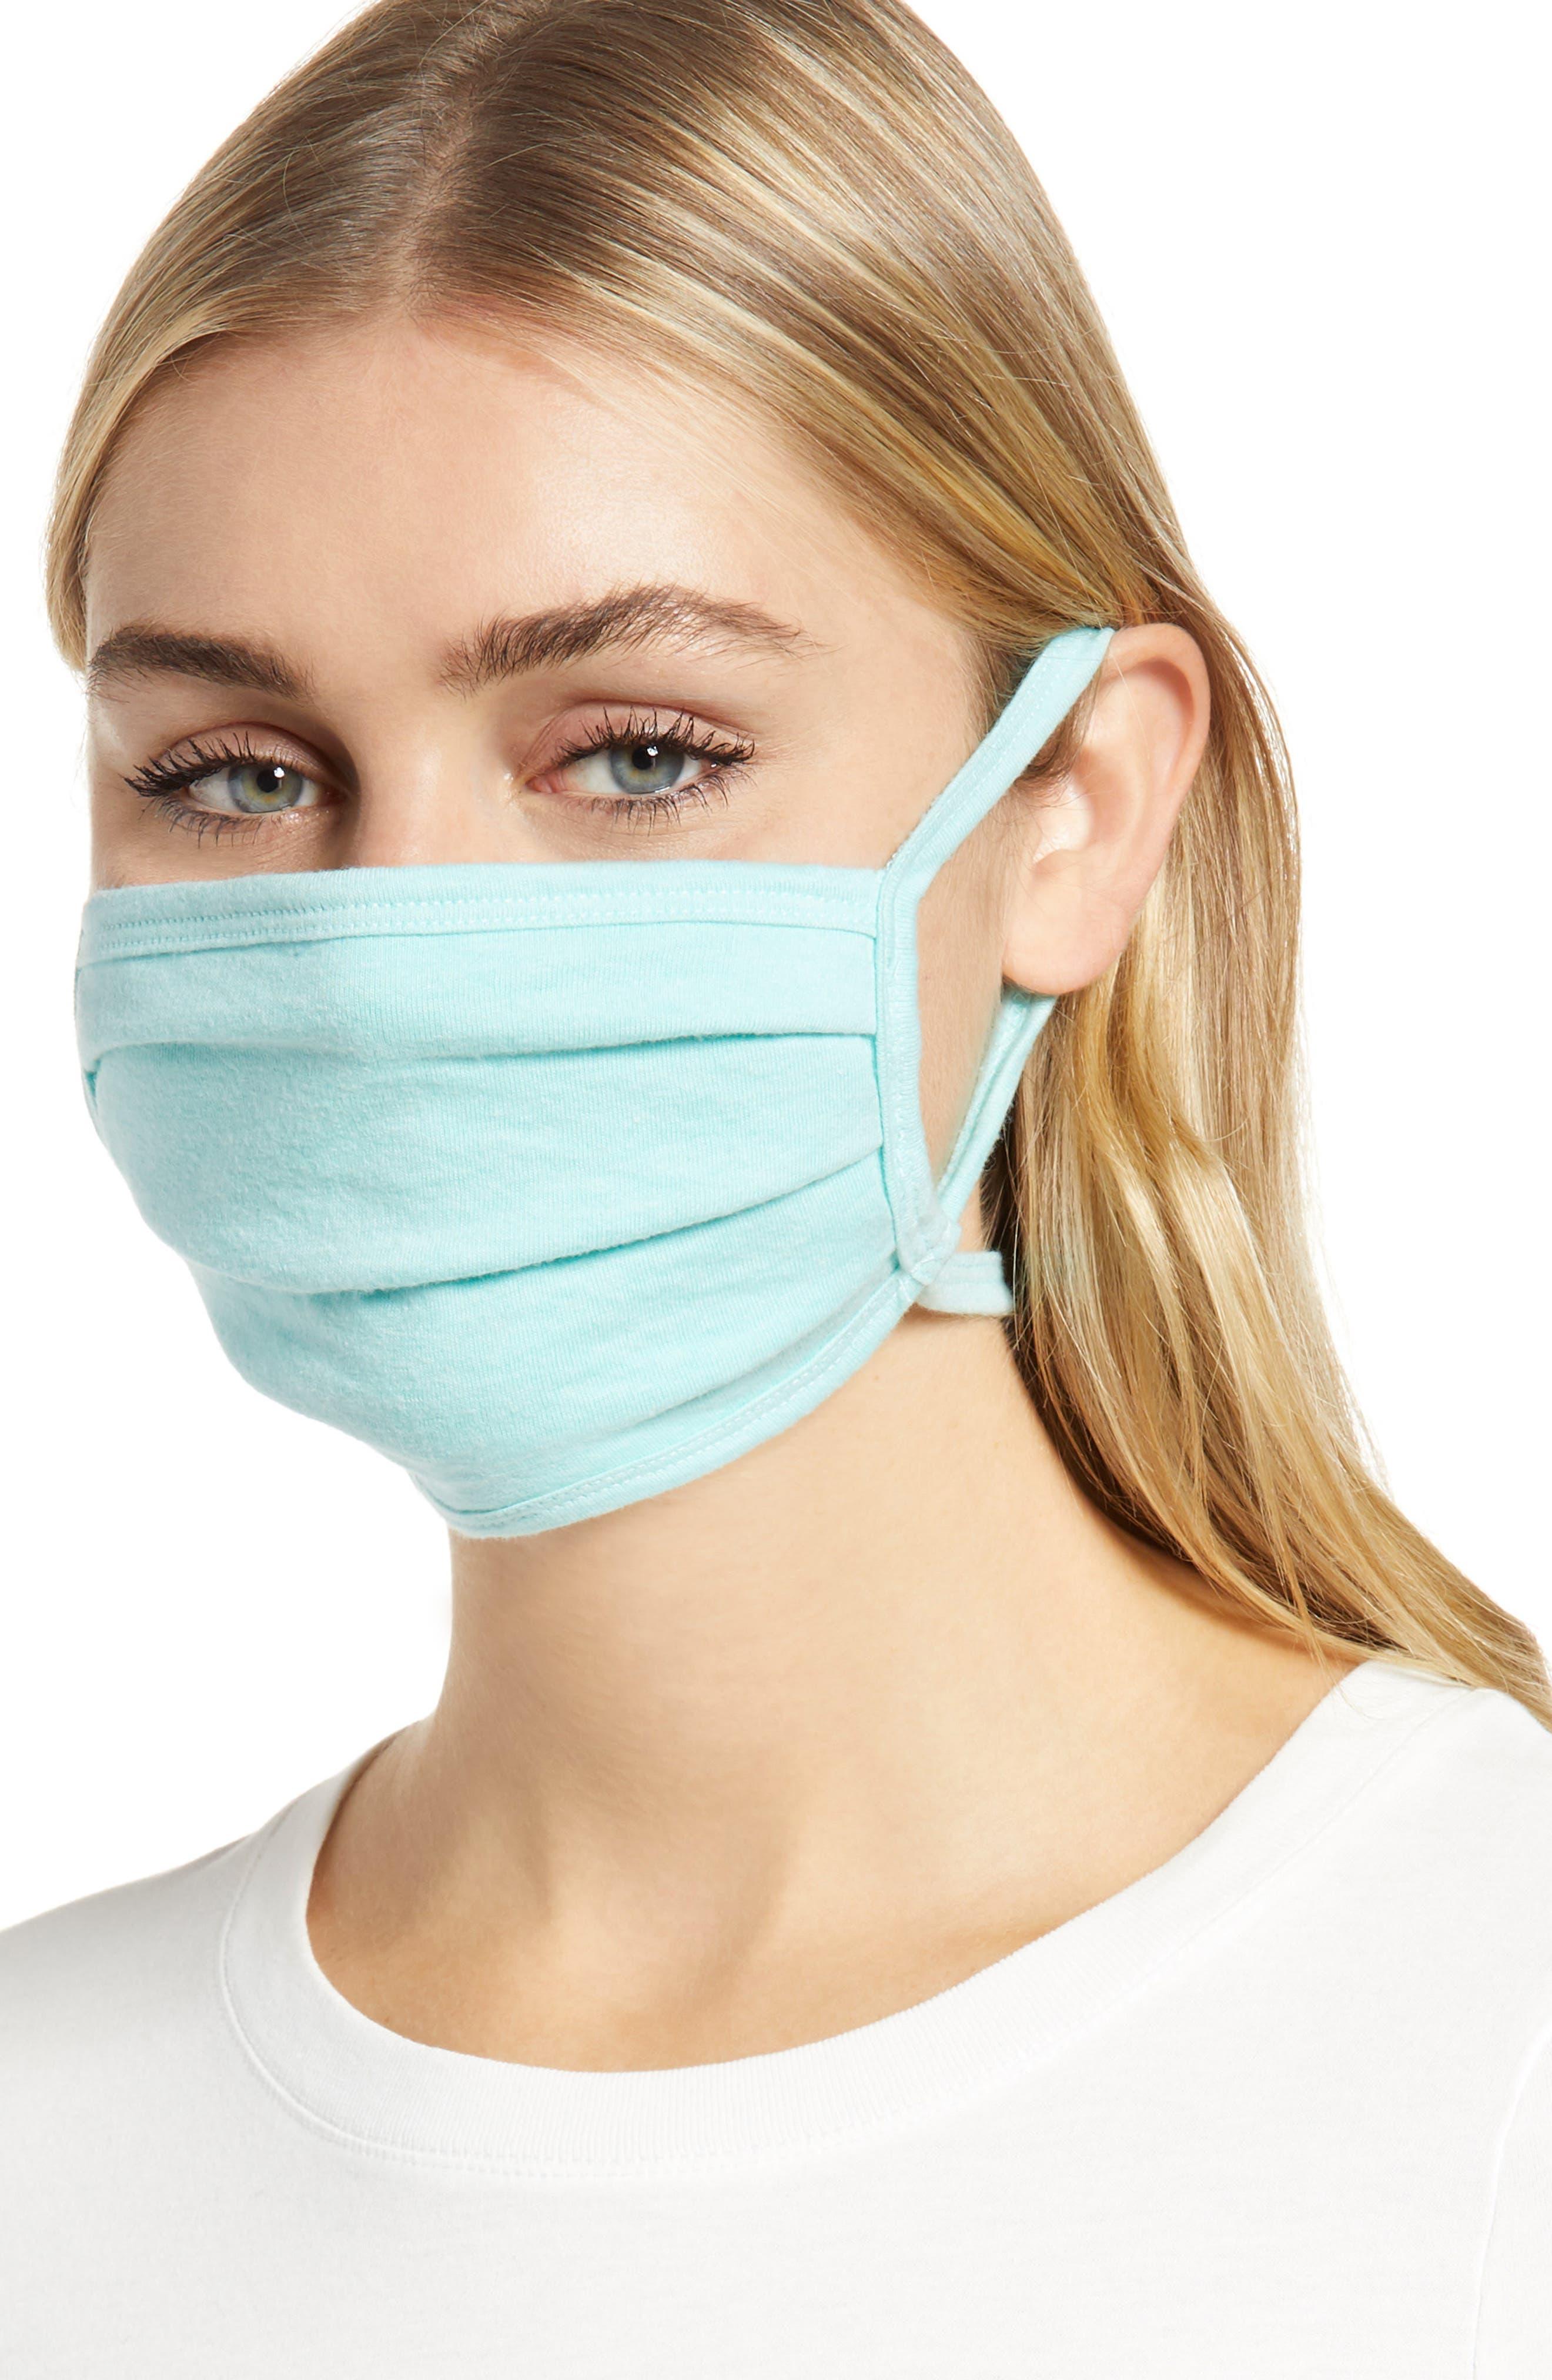 Image of Nordstrom Heathered Non-Medical Adult Face Masks - Set of 4